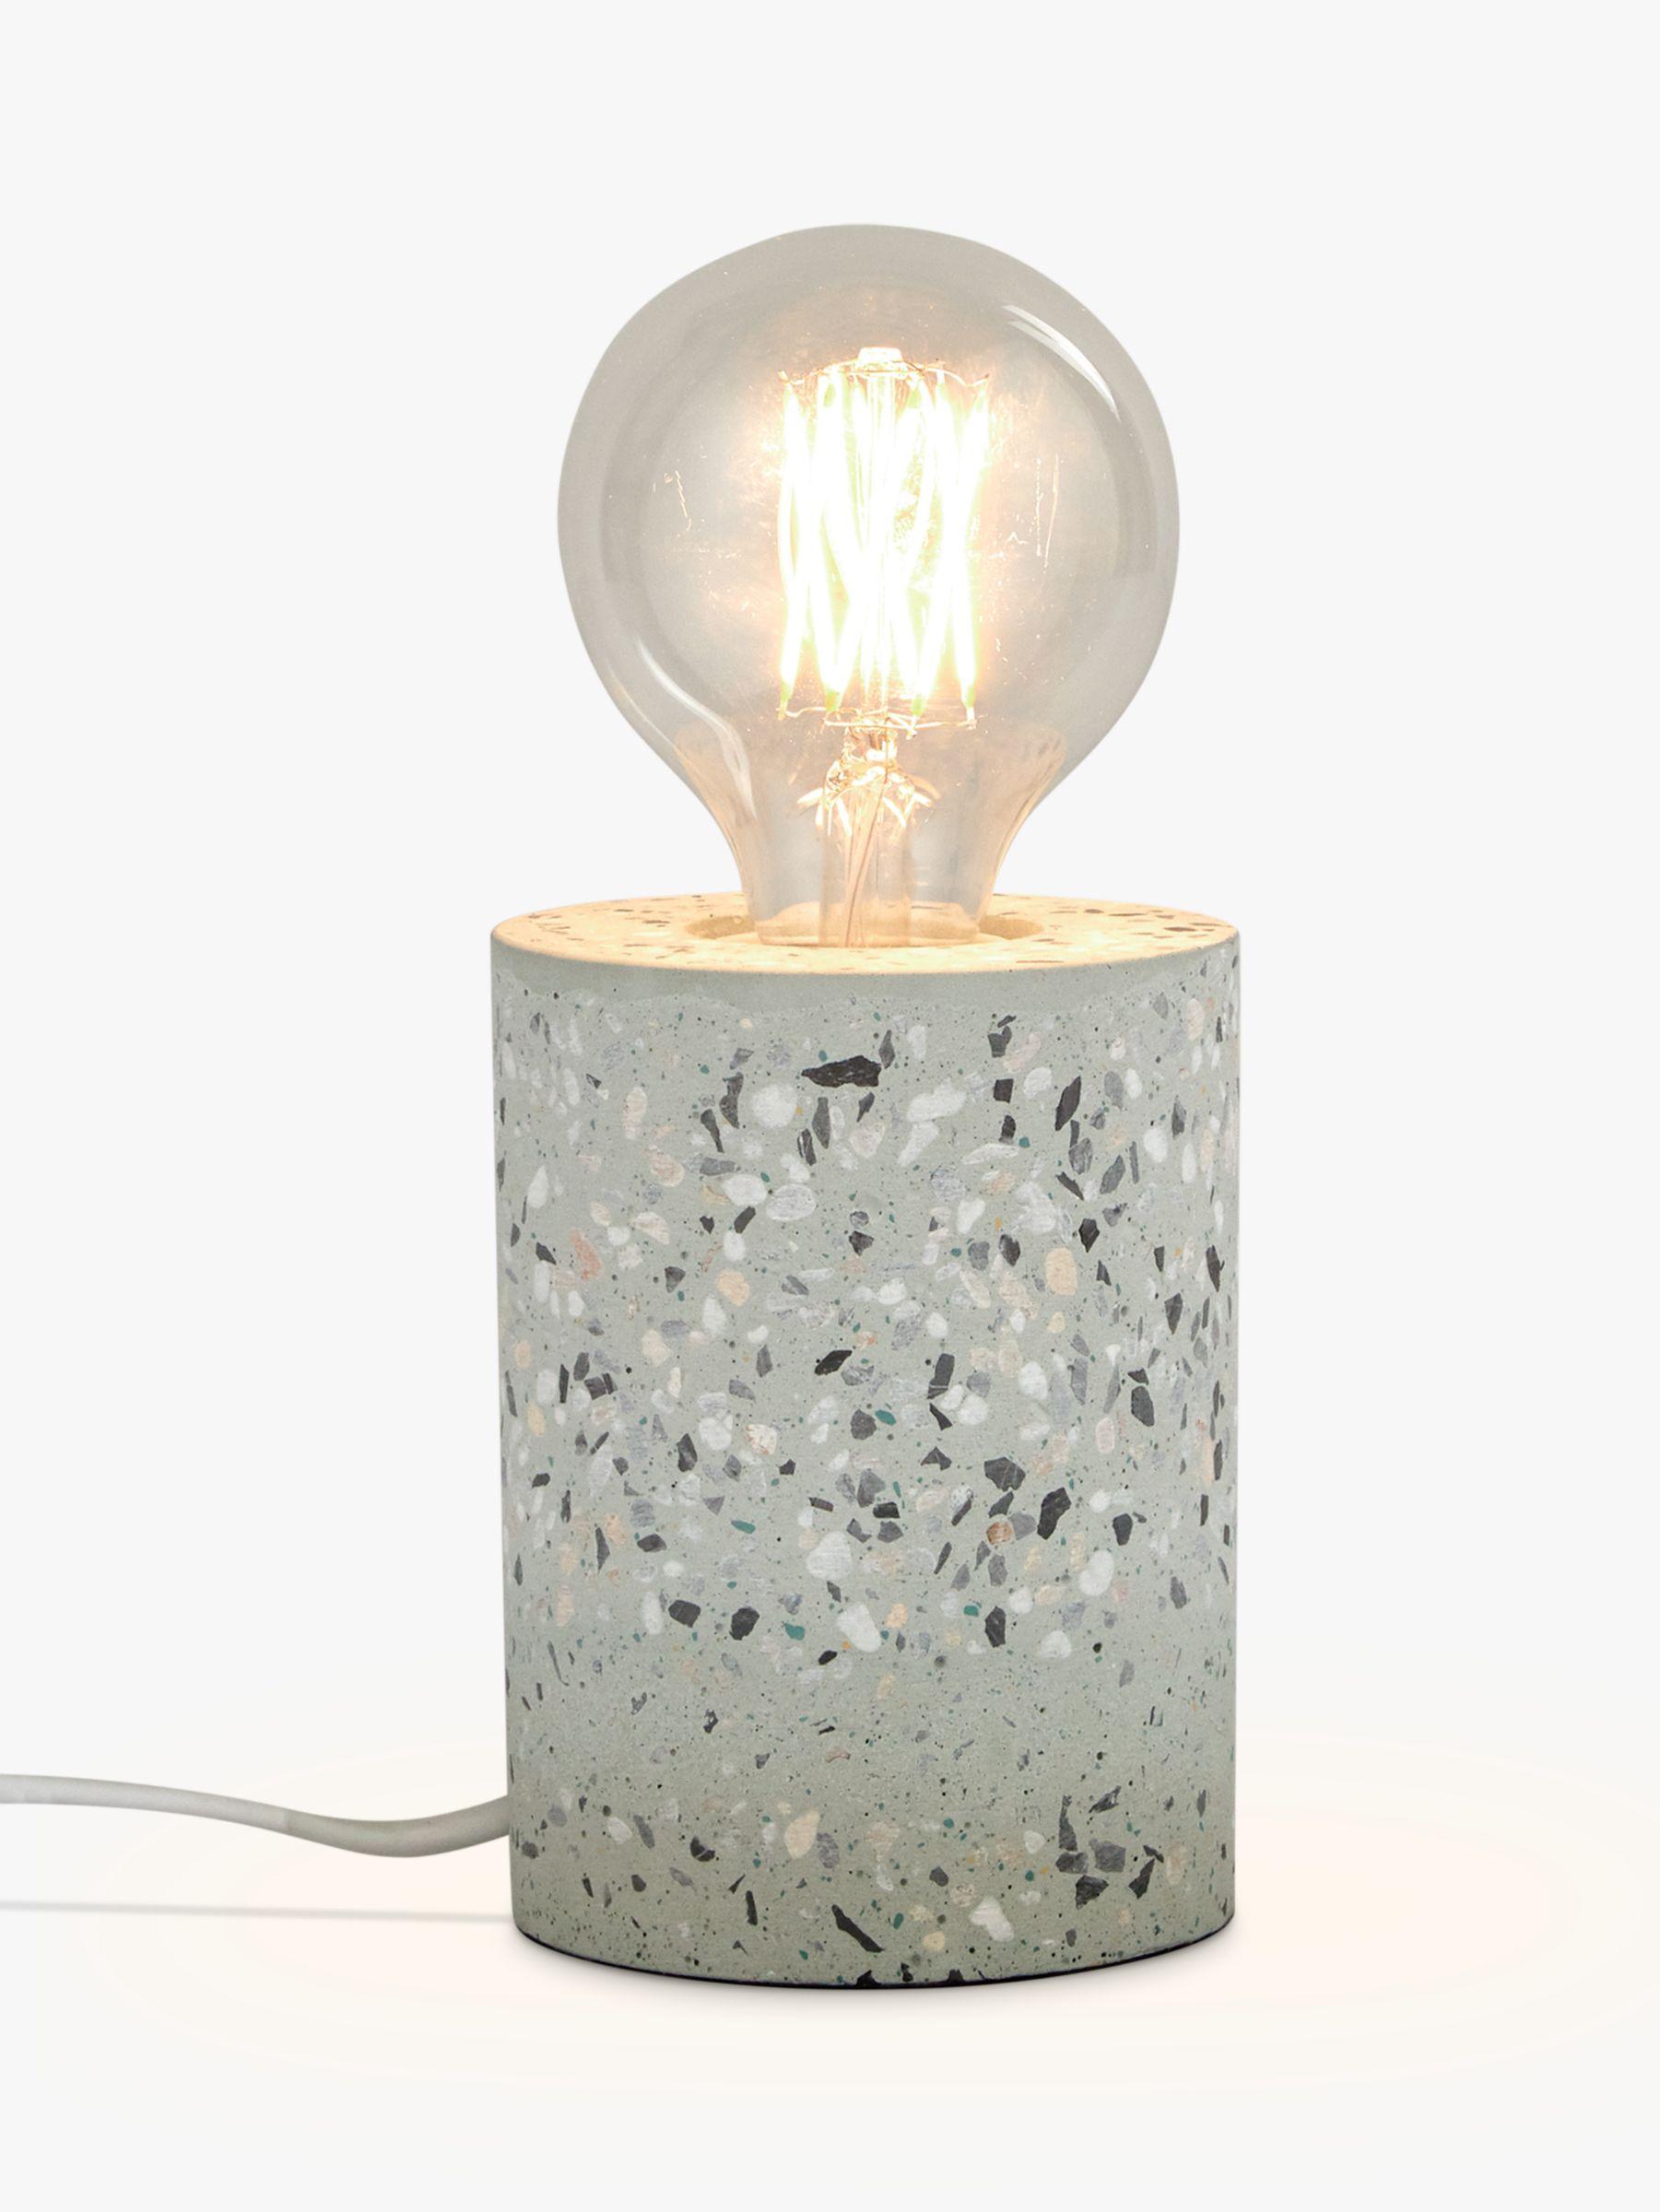 House By John Lewis Terrazzo Ceramic Bulbholder Table Lamp Blue Multi At John Lewis Partners